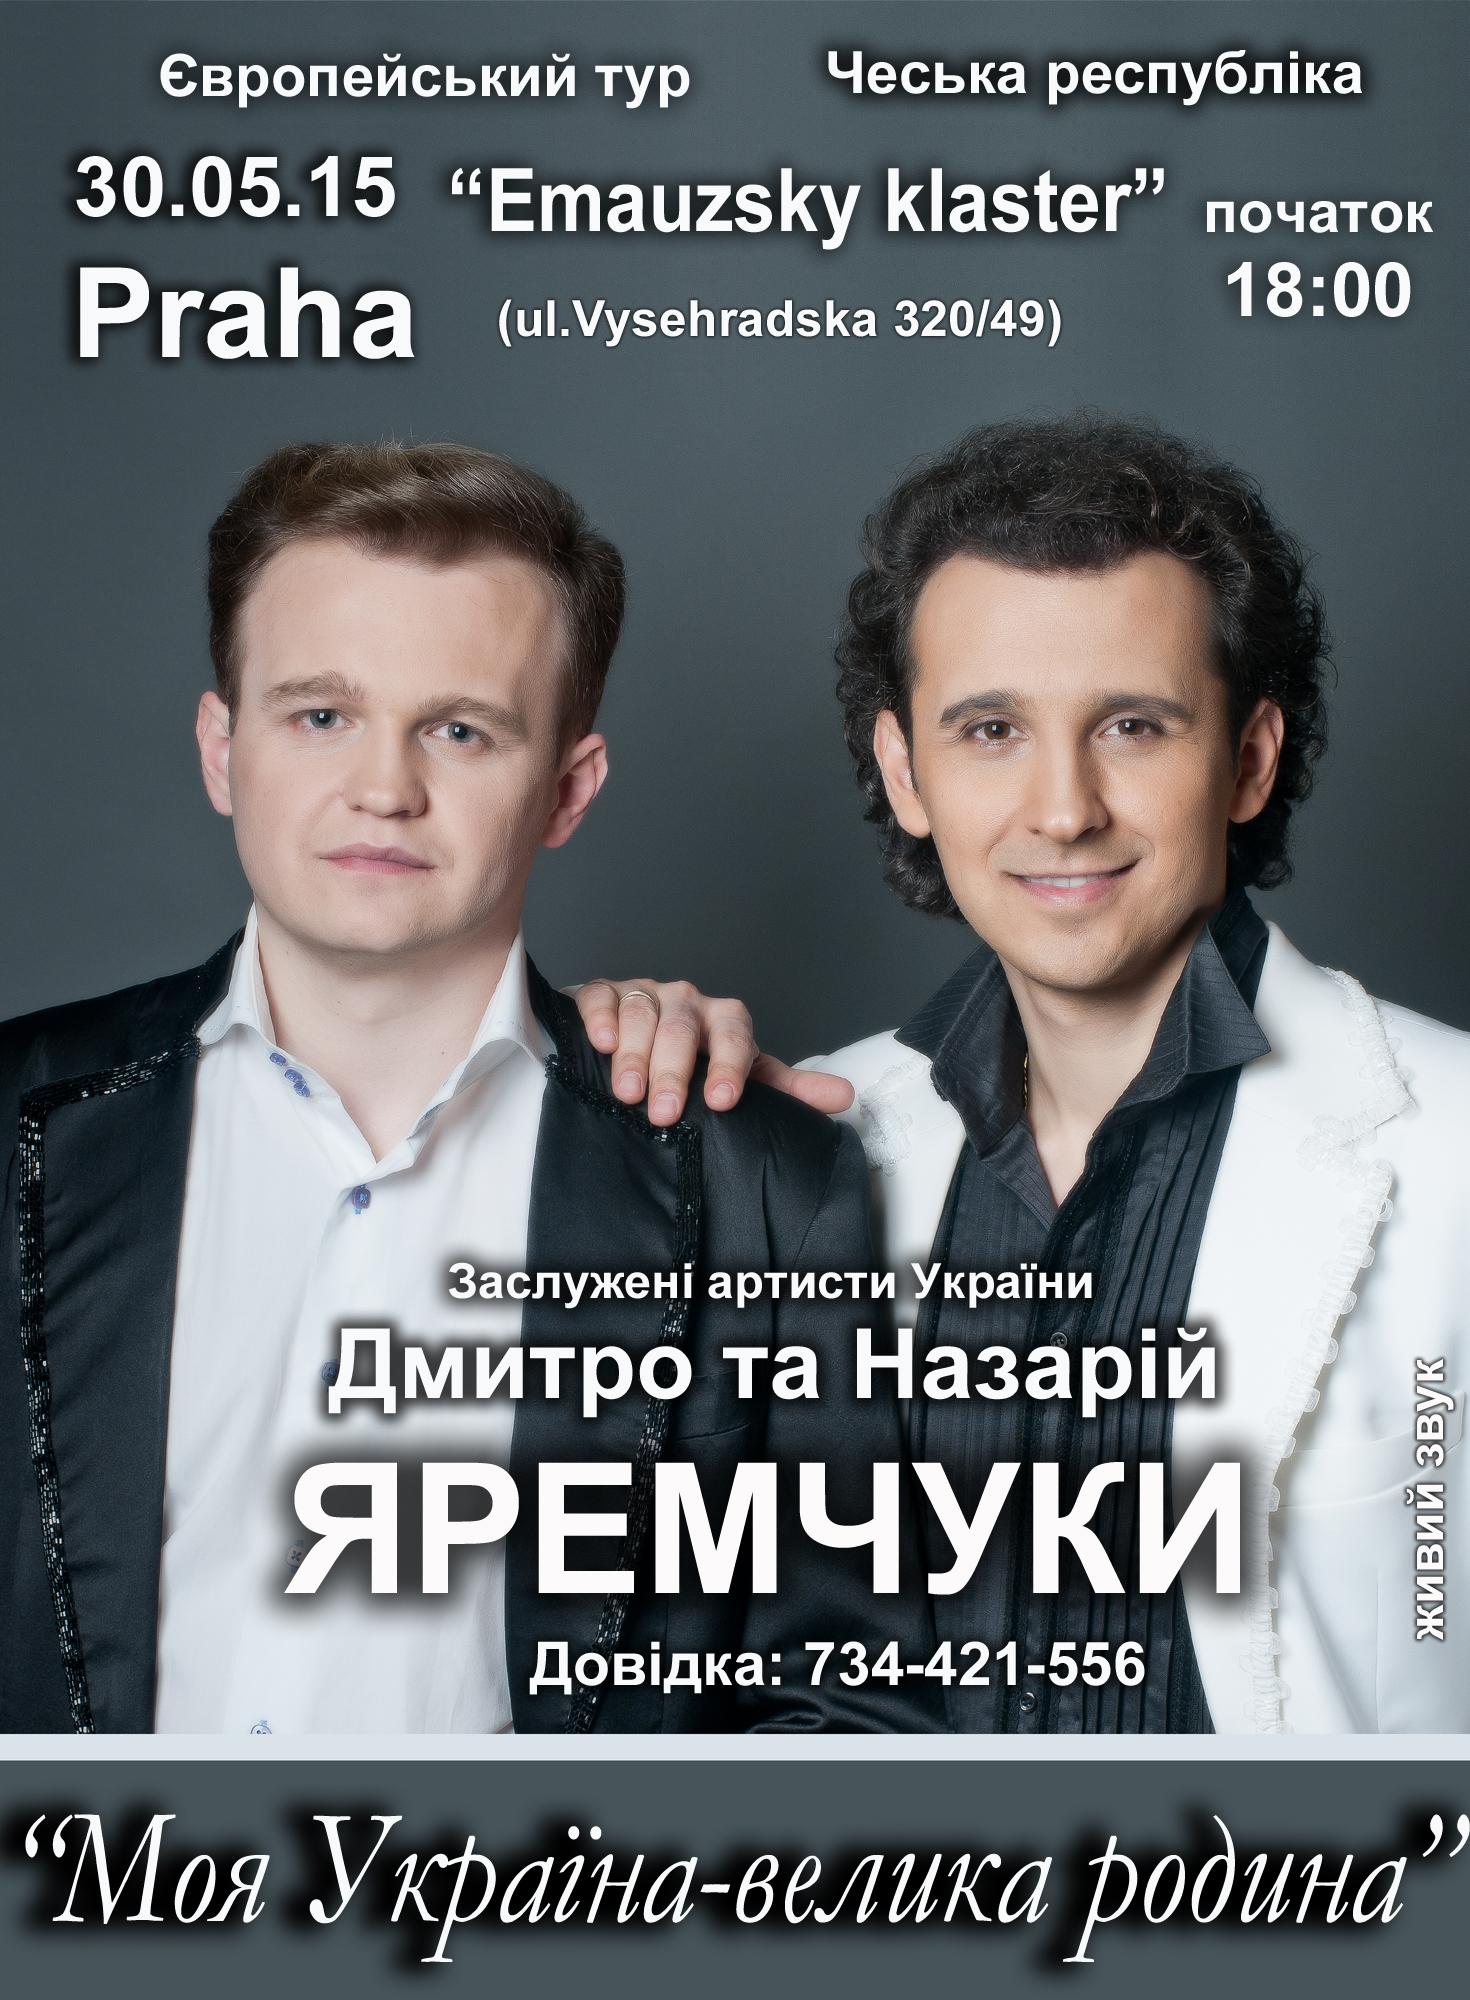 Яремчуки,Yaremchuky